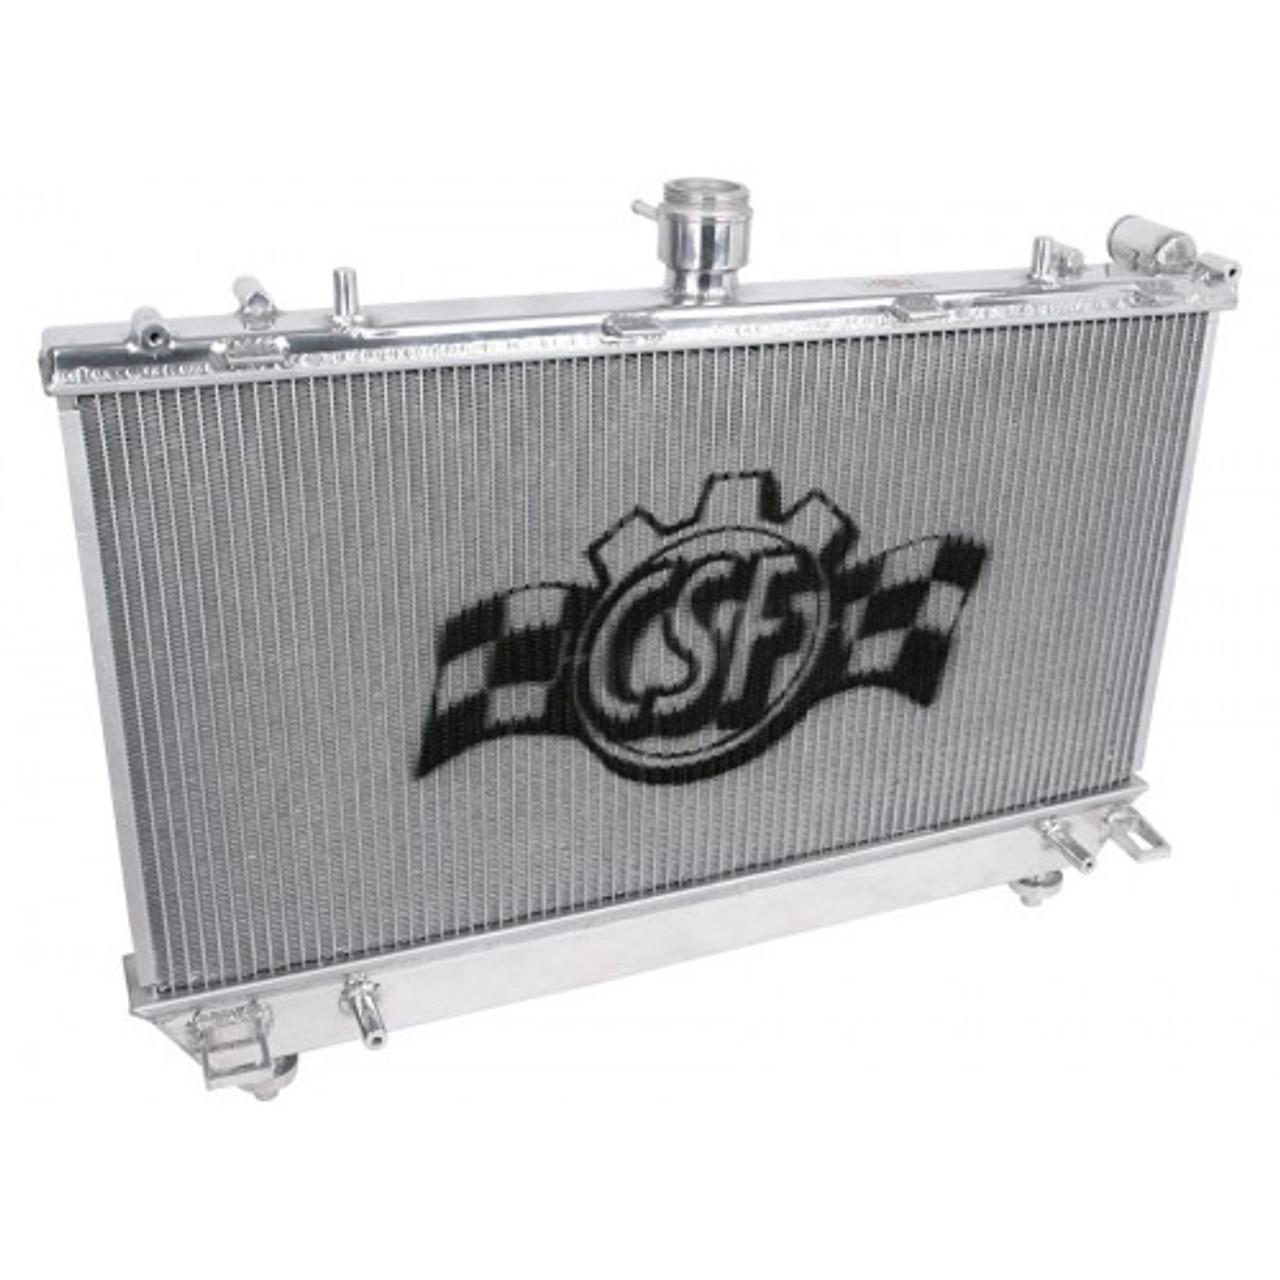 Cooler Cooling Antifreeze Coolant yf CSF Radiator for 2007-2012 BMW 335i